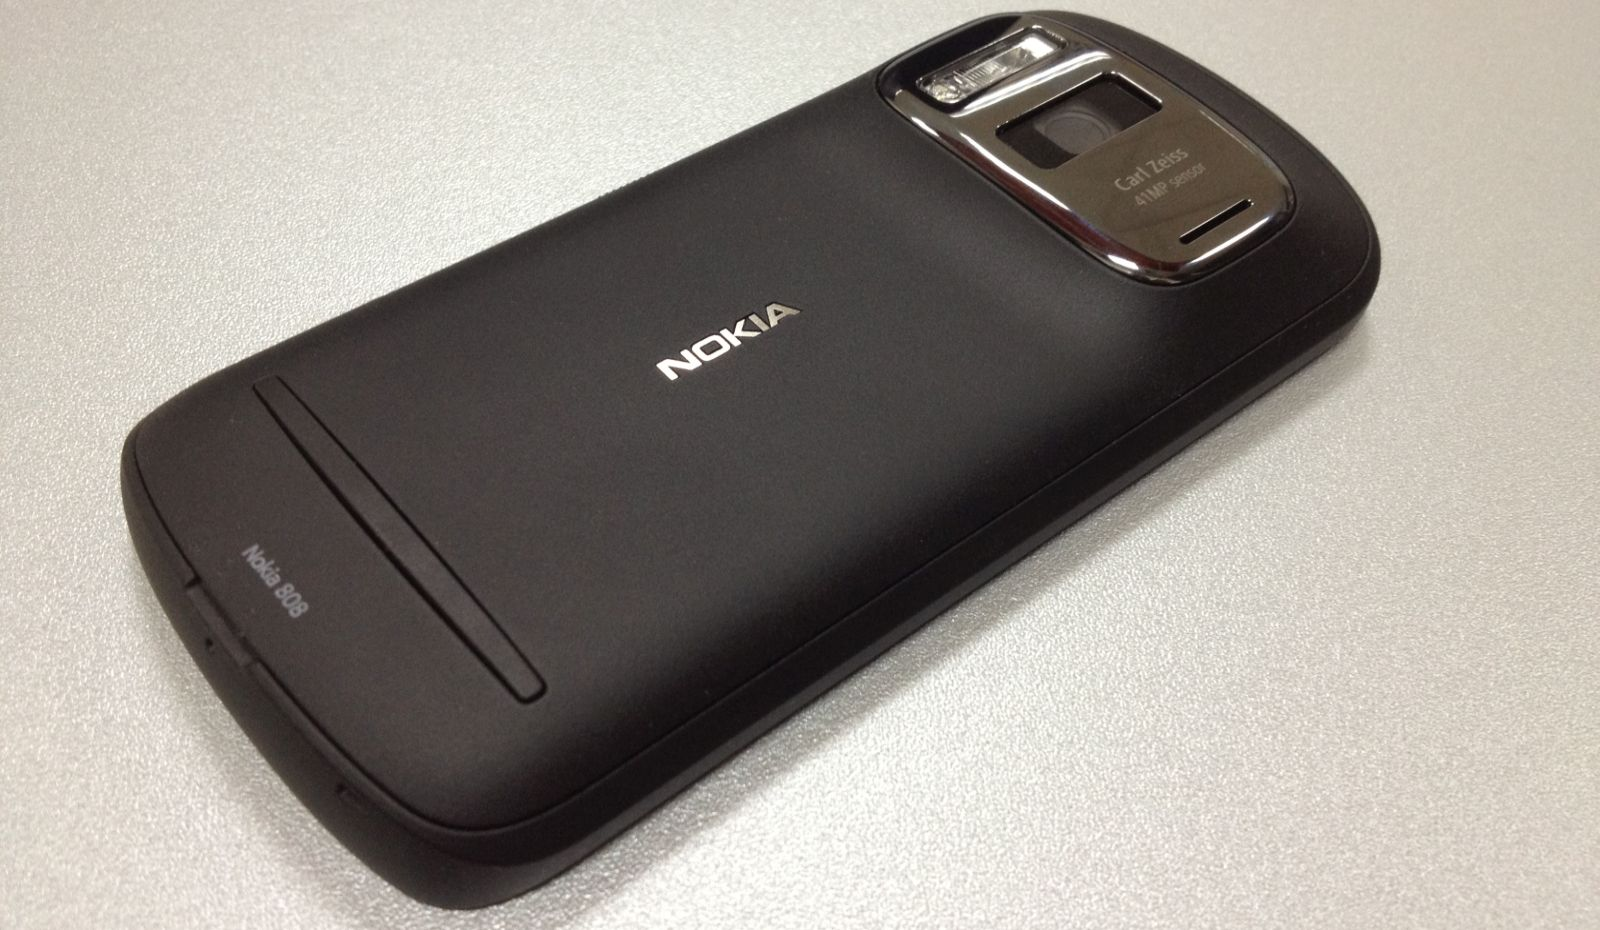 Nokia 808 PureView John Karakatsanis